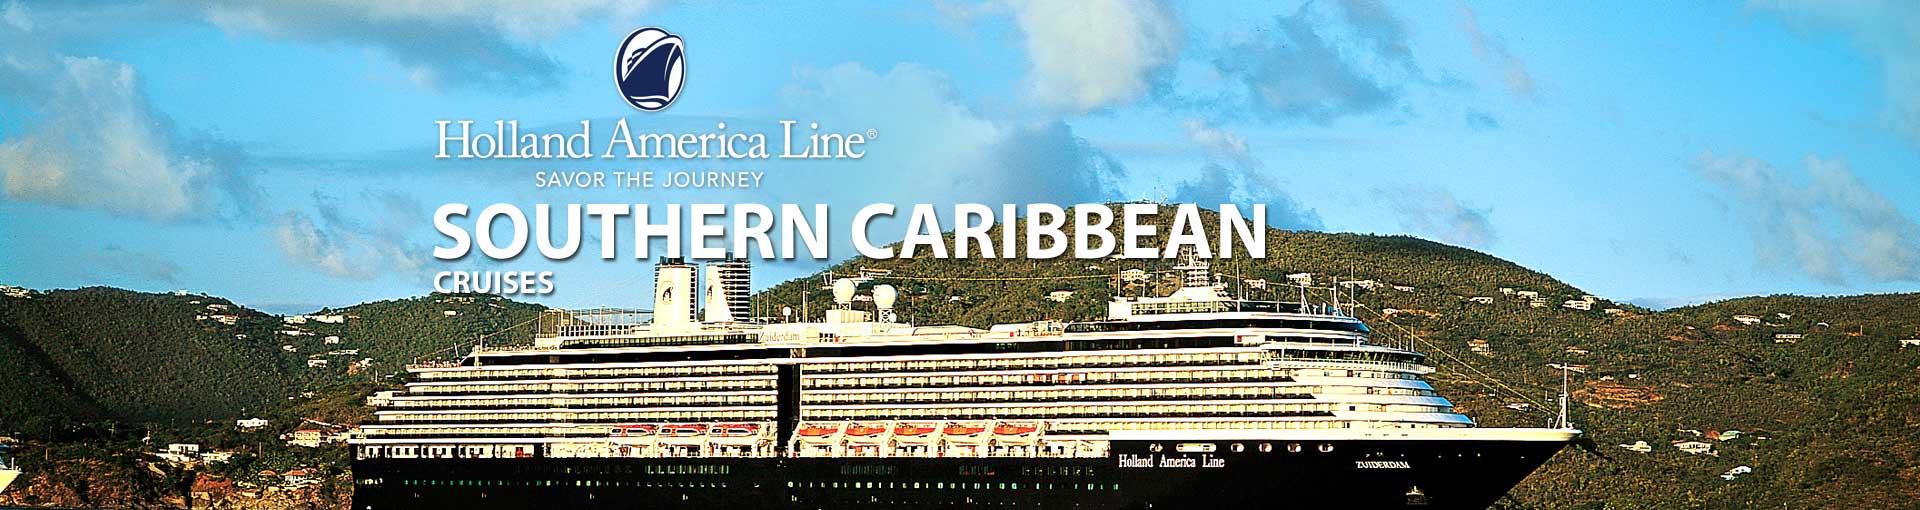 Holland America Southern Caribbean Cruises